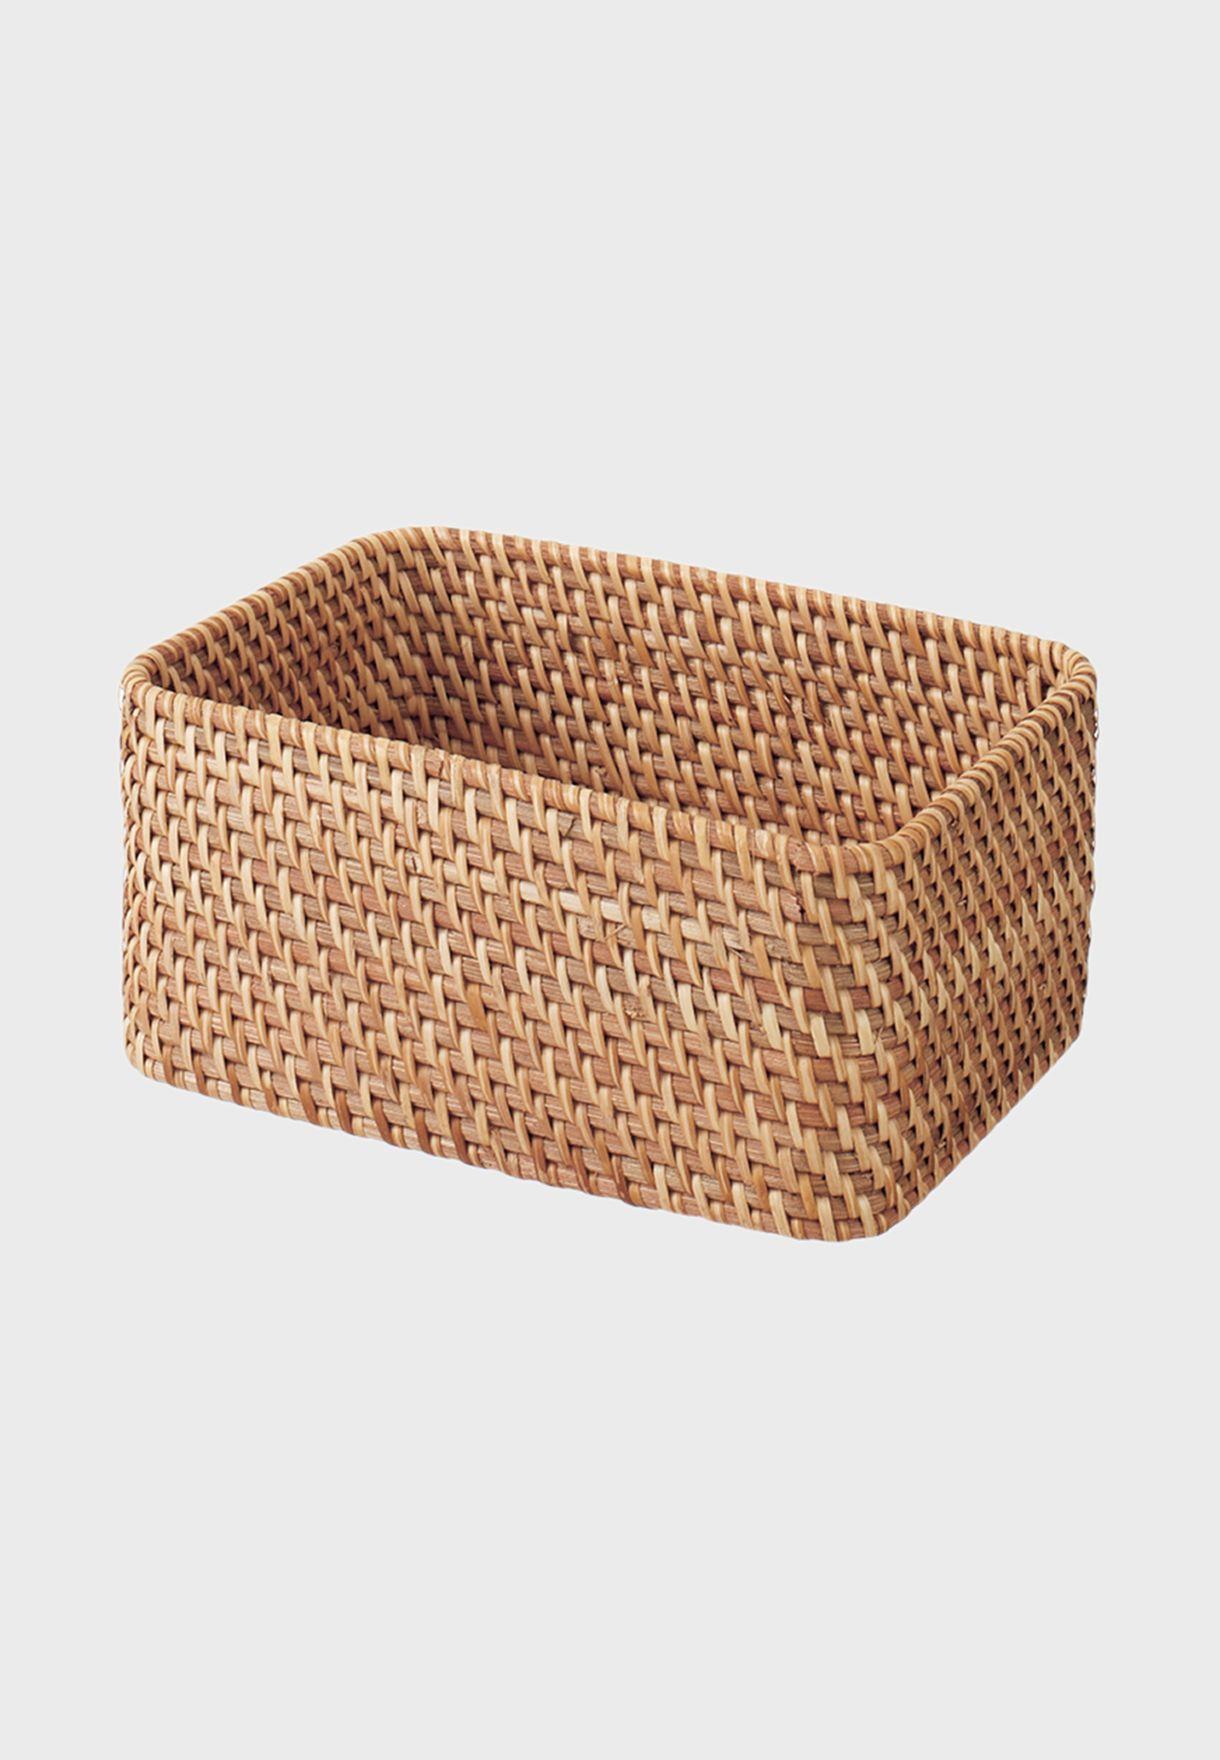 Stackable Rattan Box